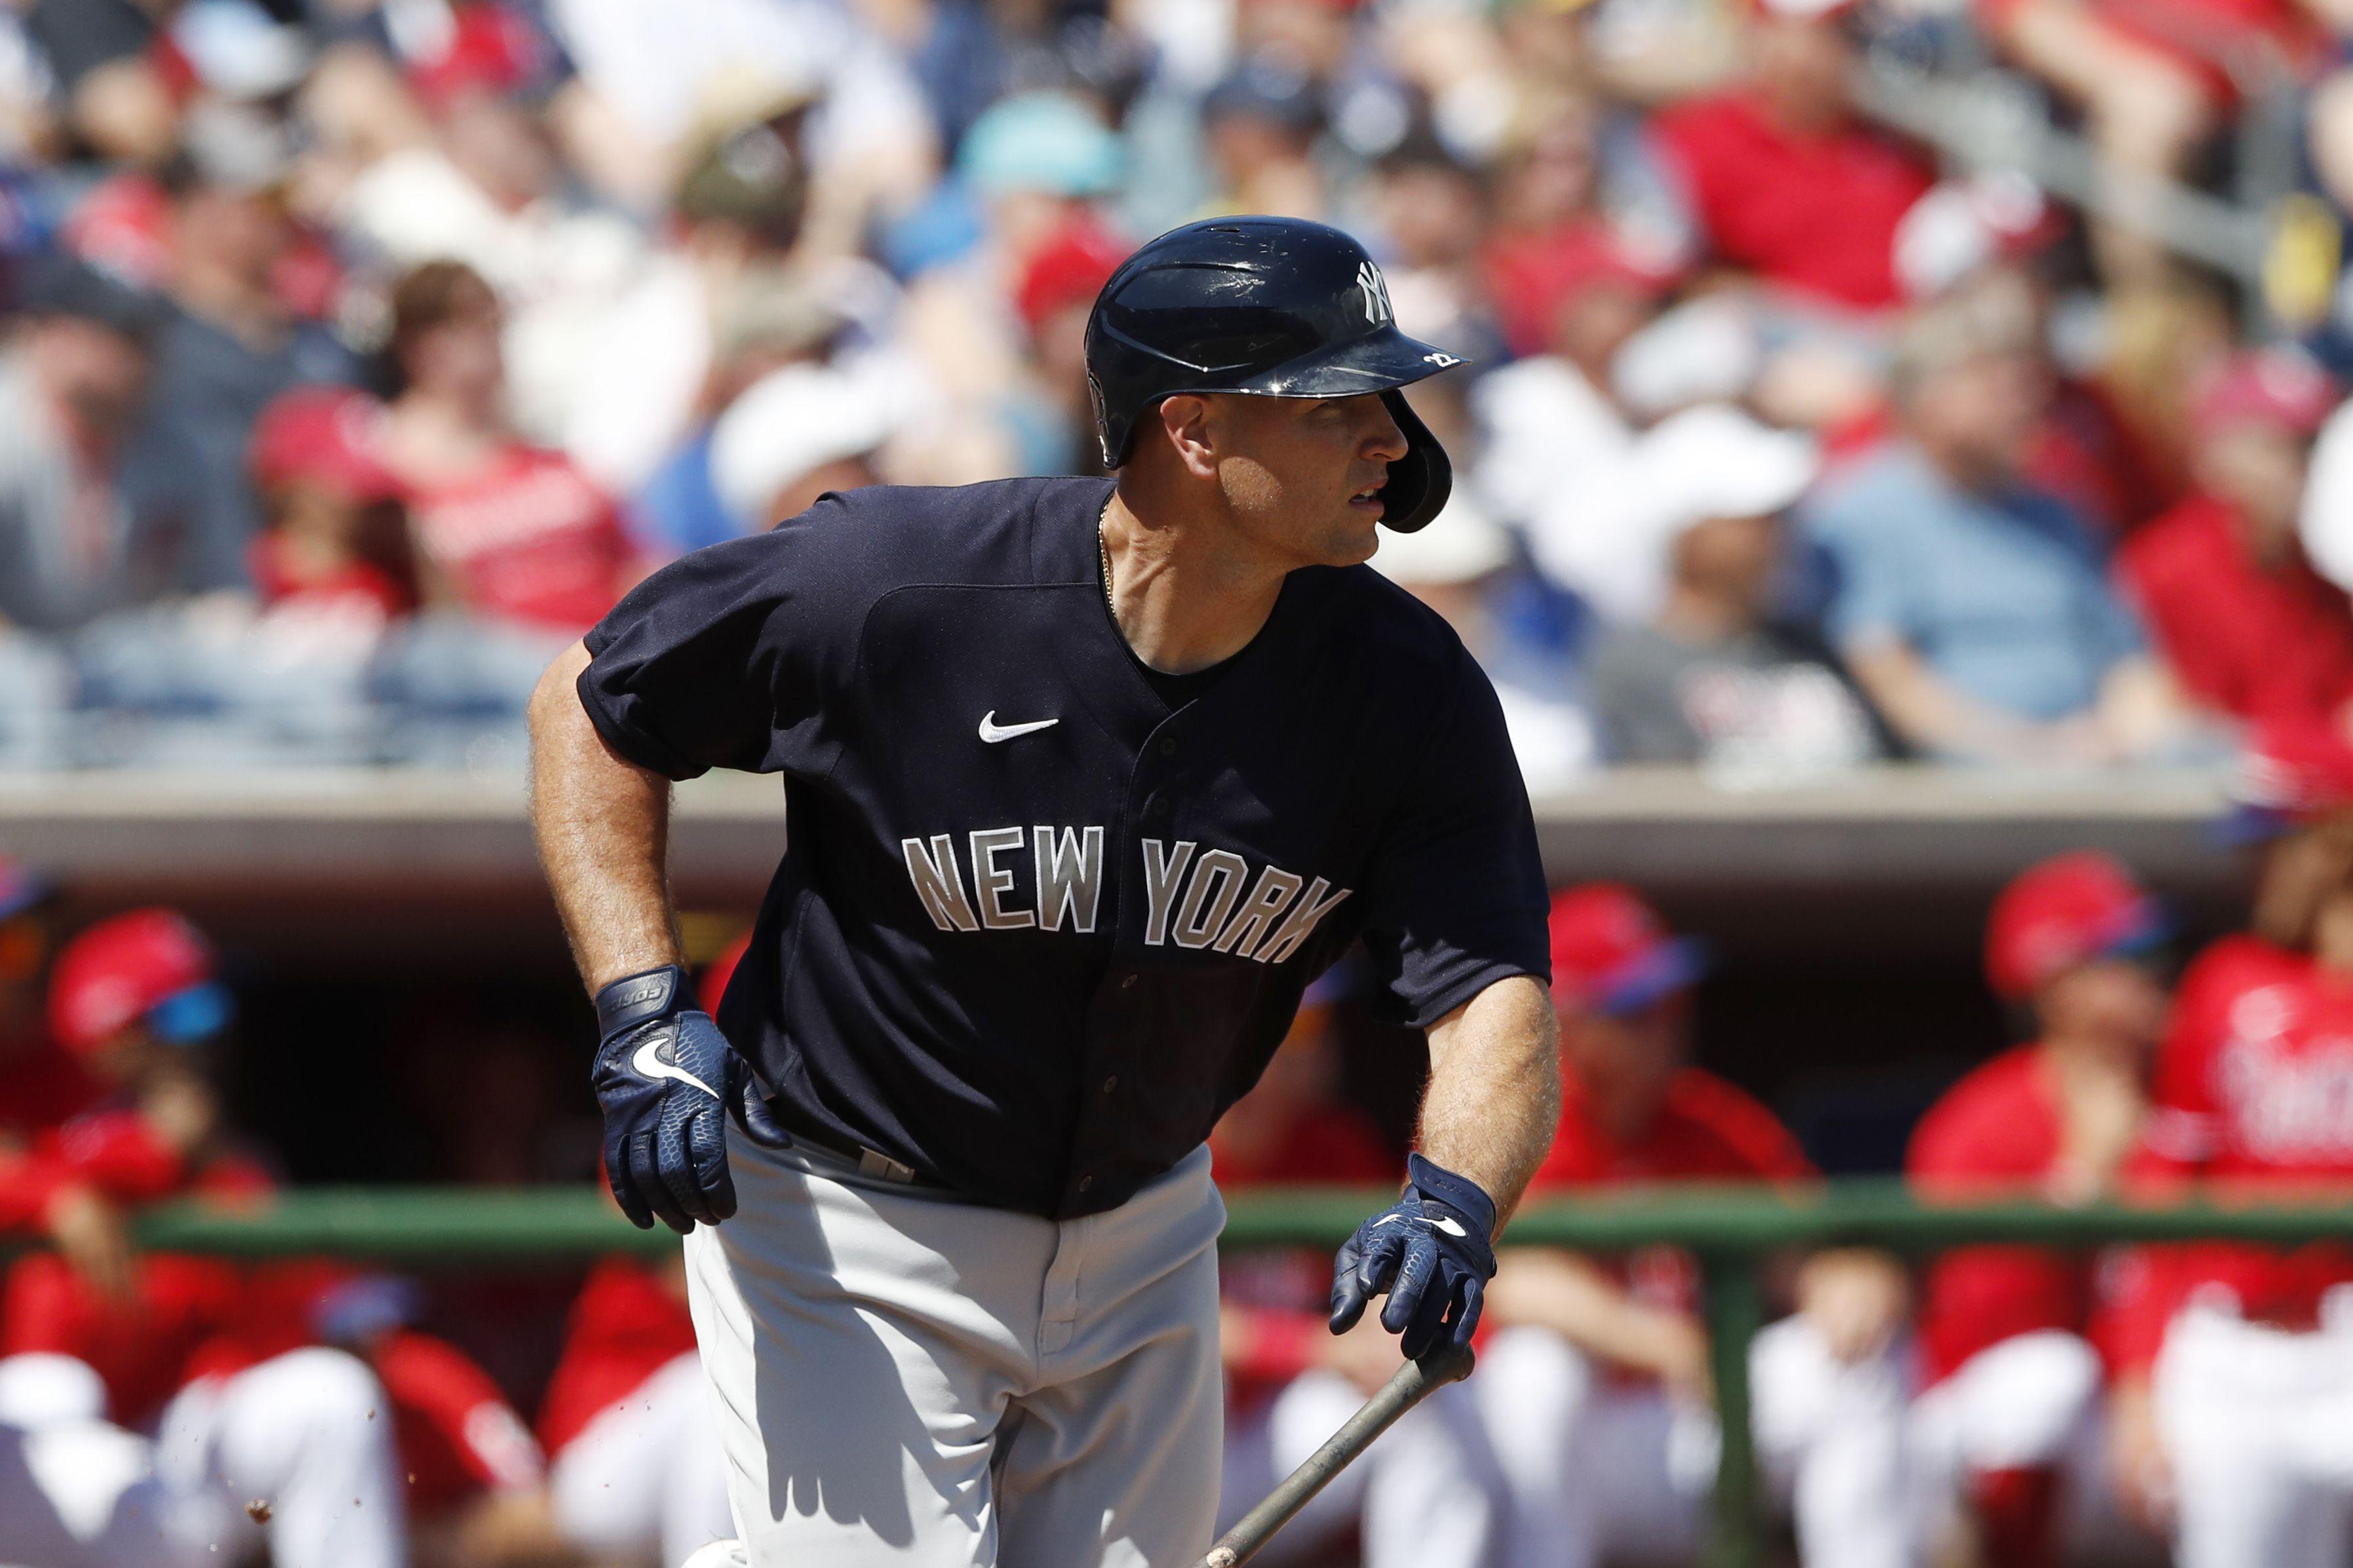 Chris Iannetta Colorado Rockies Baseball Player Jersey